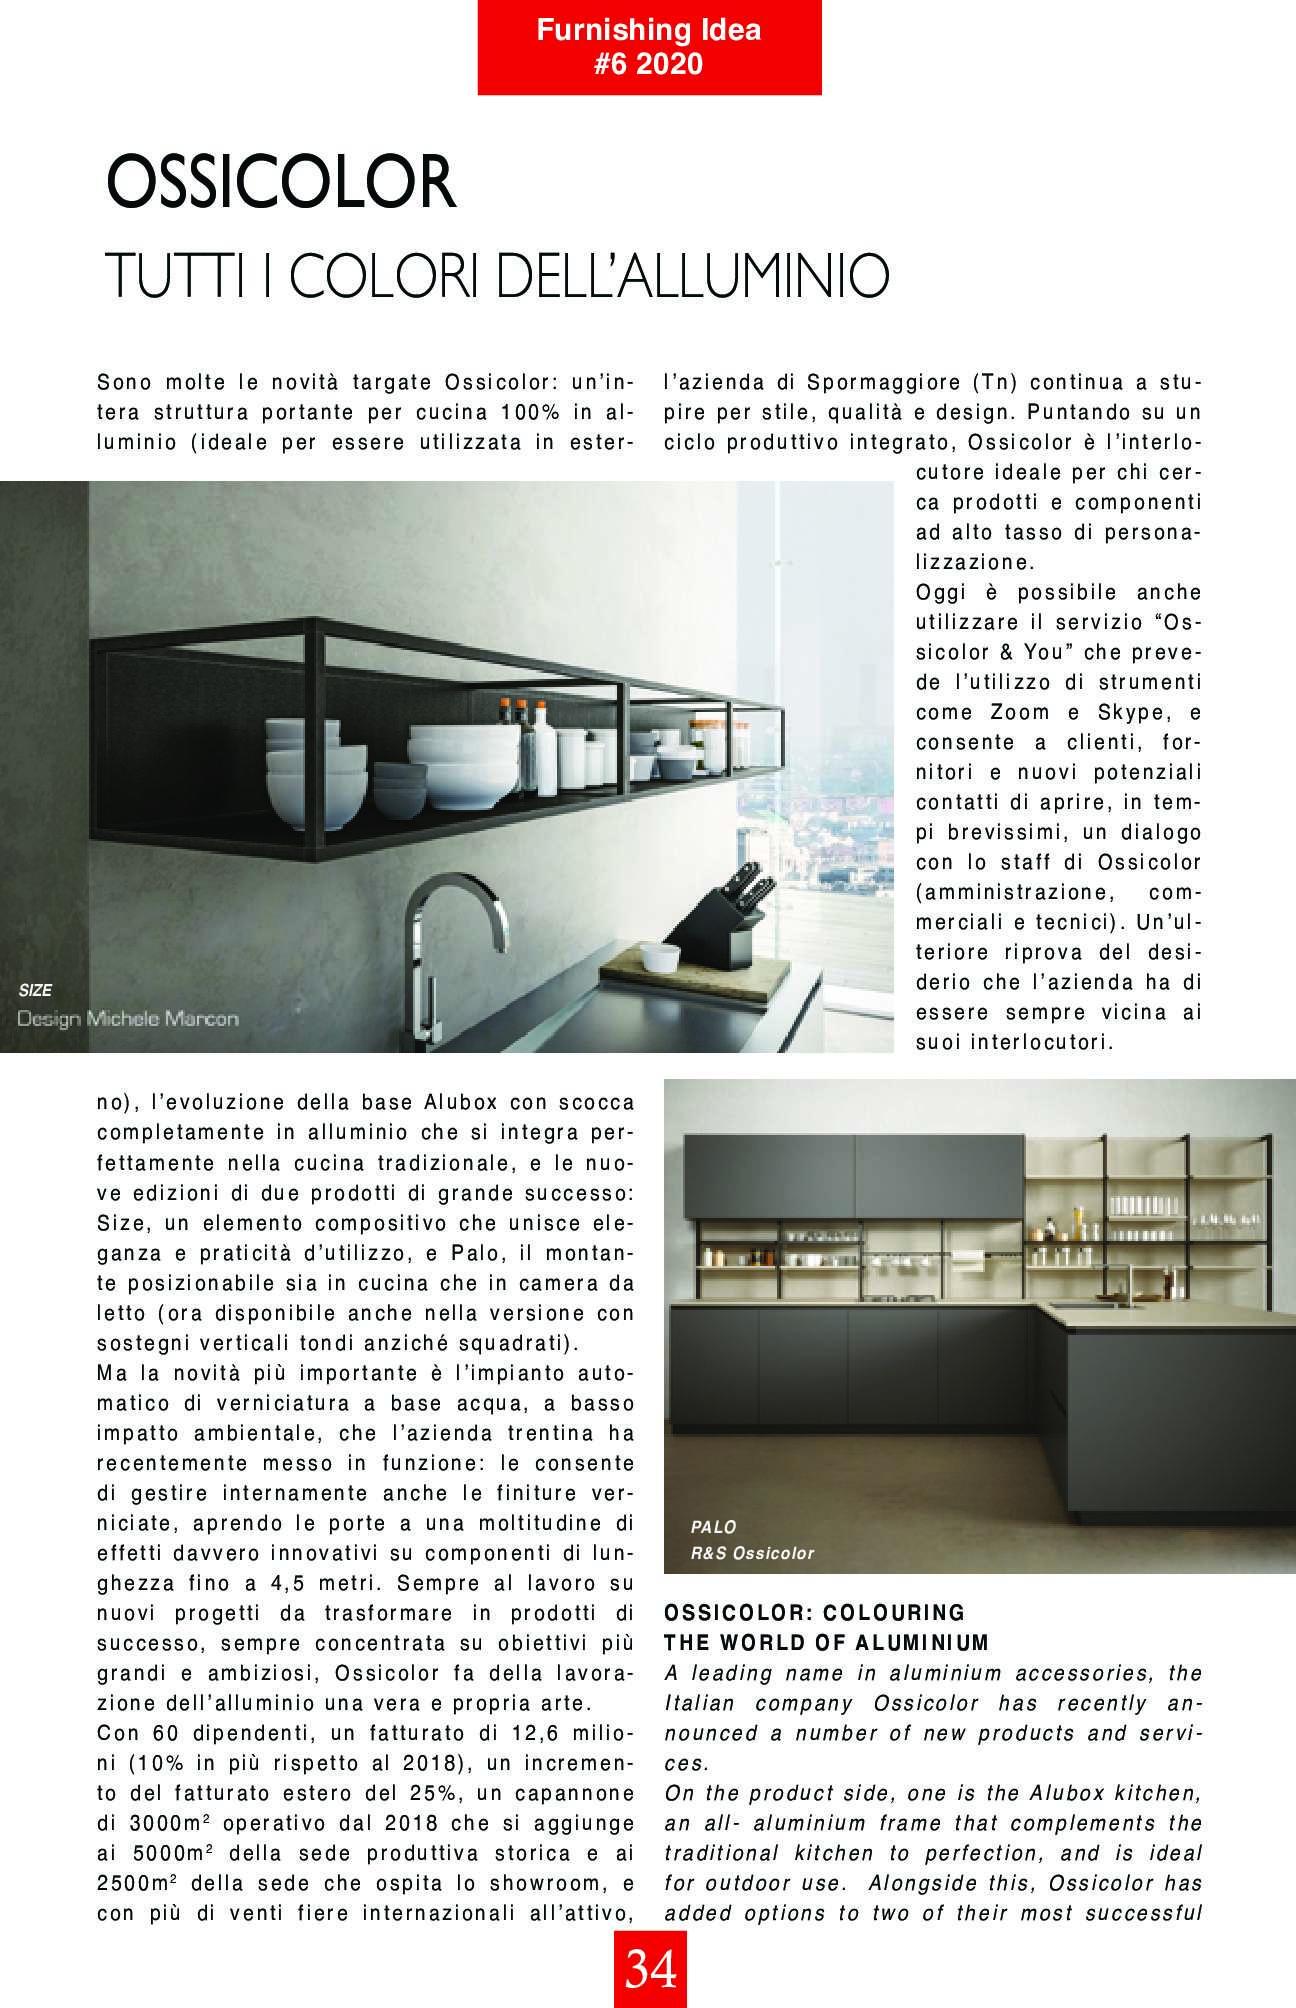 furnishingidea-6-2020_journal_22_033.jpg